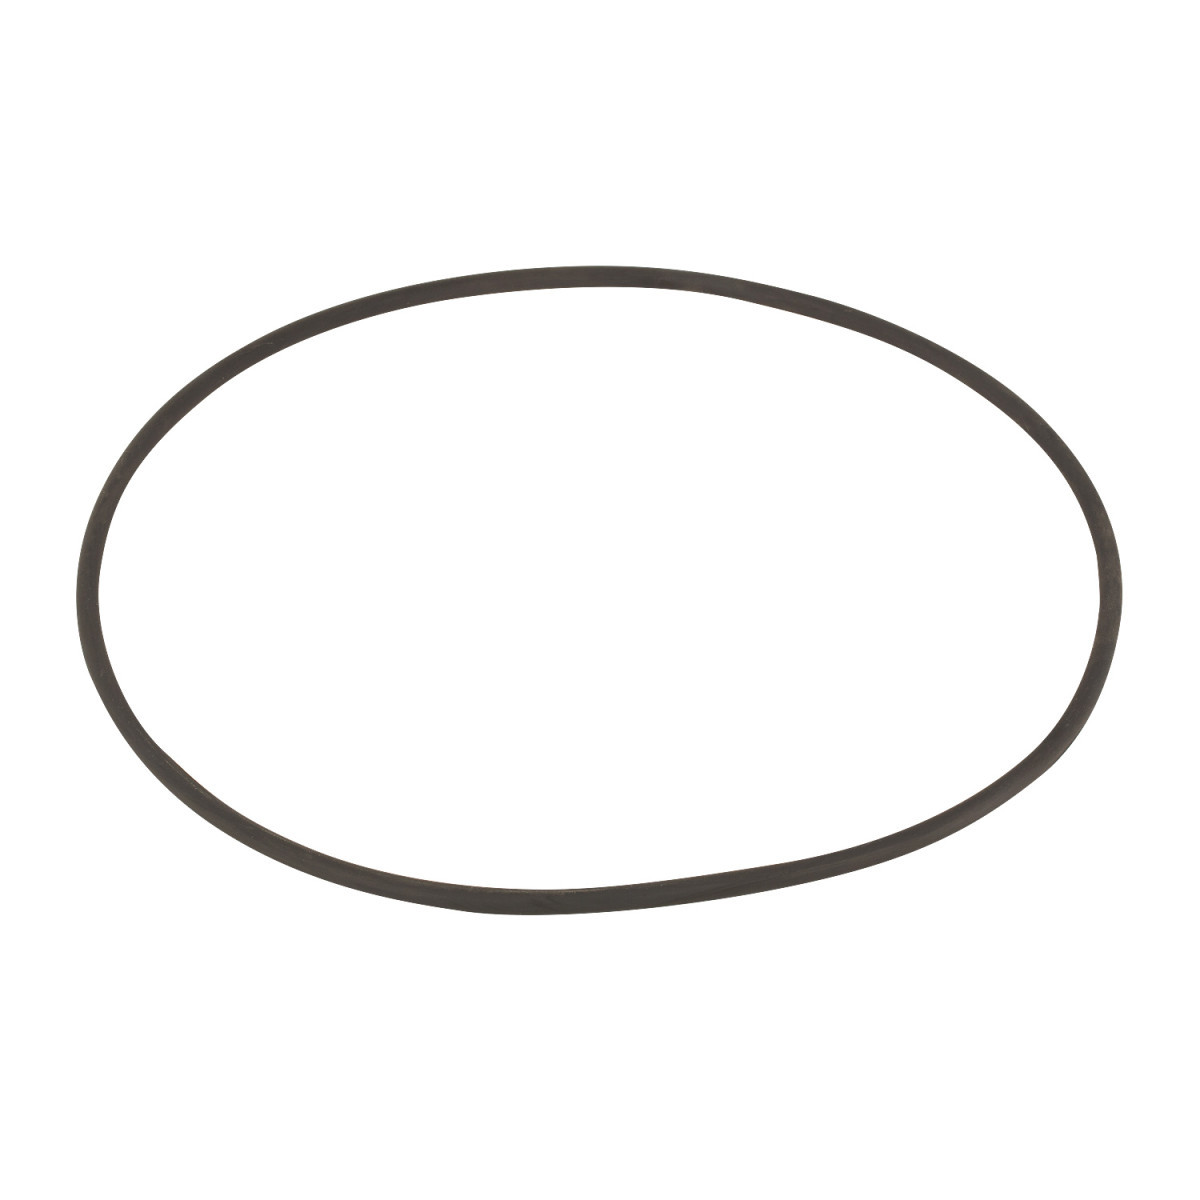 Уплотнительное кольцо Emaux крышки крана MPV-05 2011021